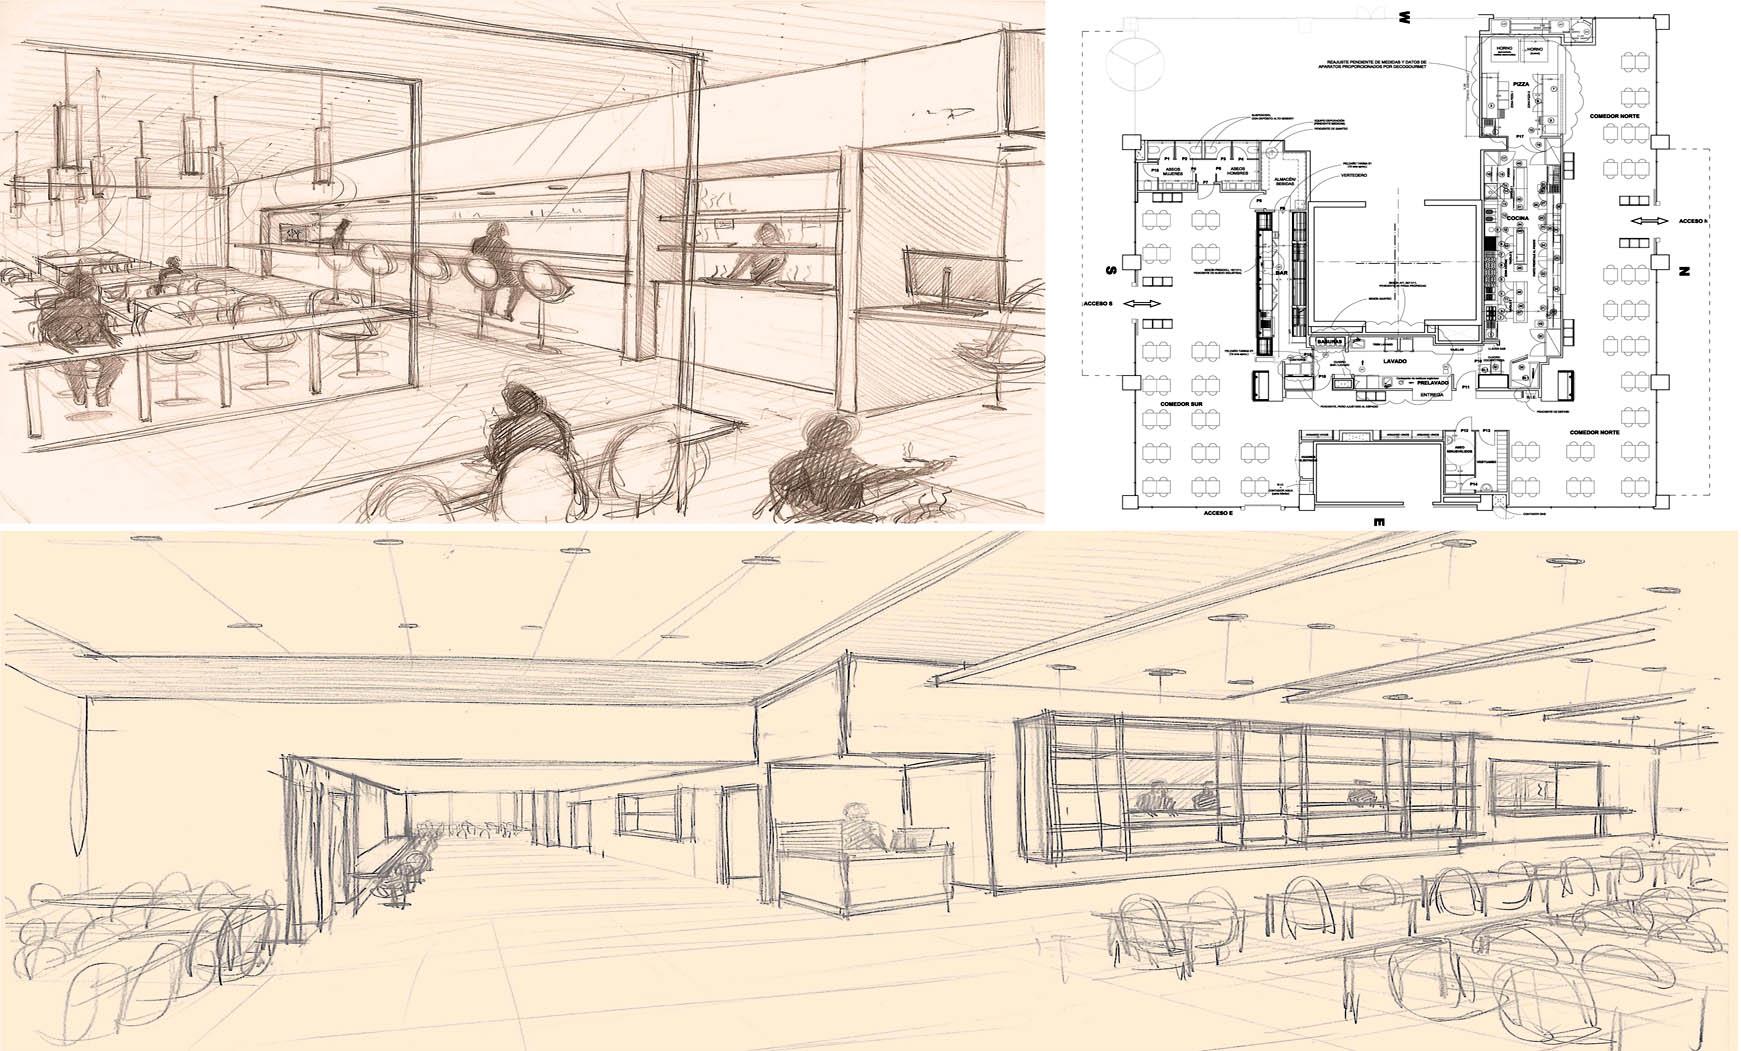 Reforma interior para restaurante en pl. Europa, Hospitalet de Llobregat. Proy. ejecutivo, 2012